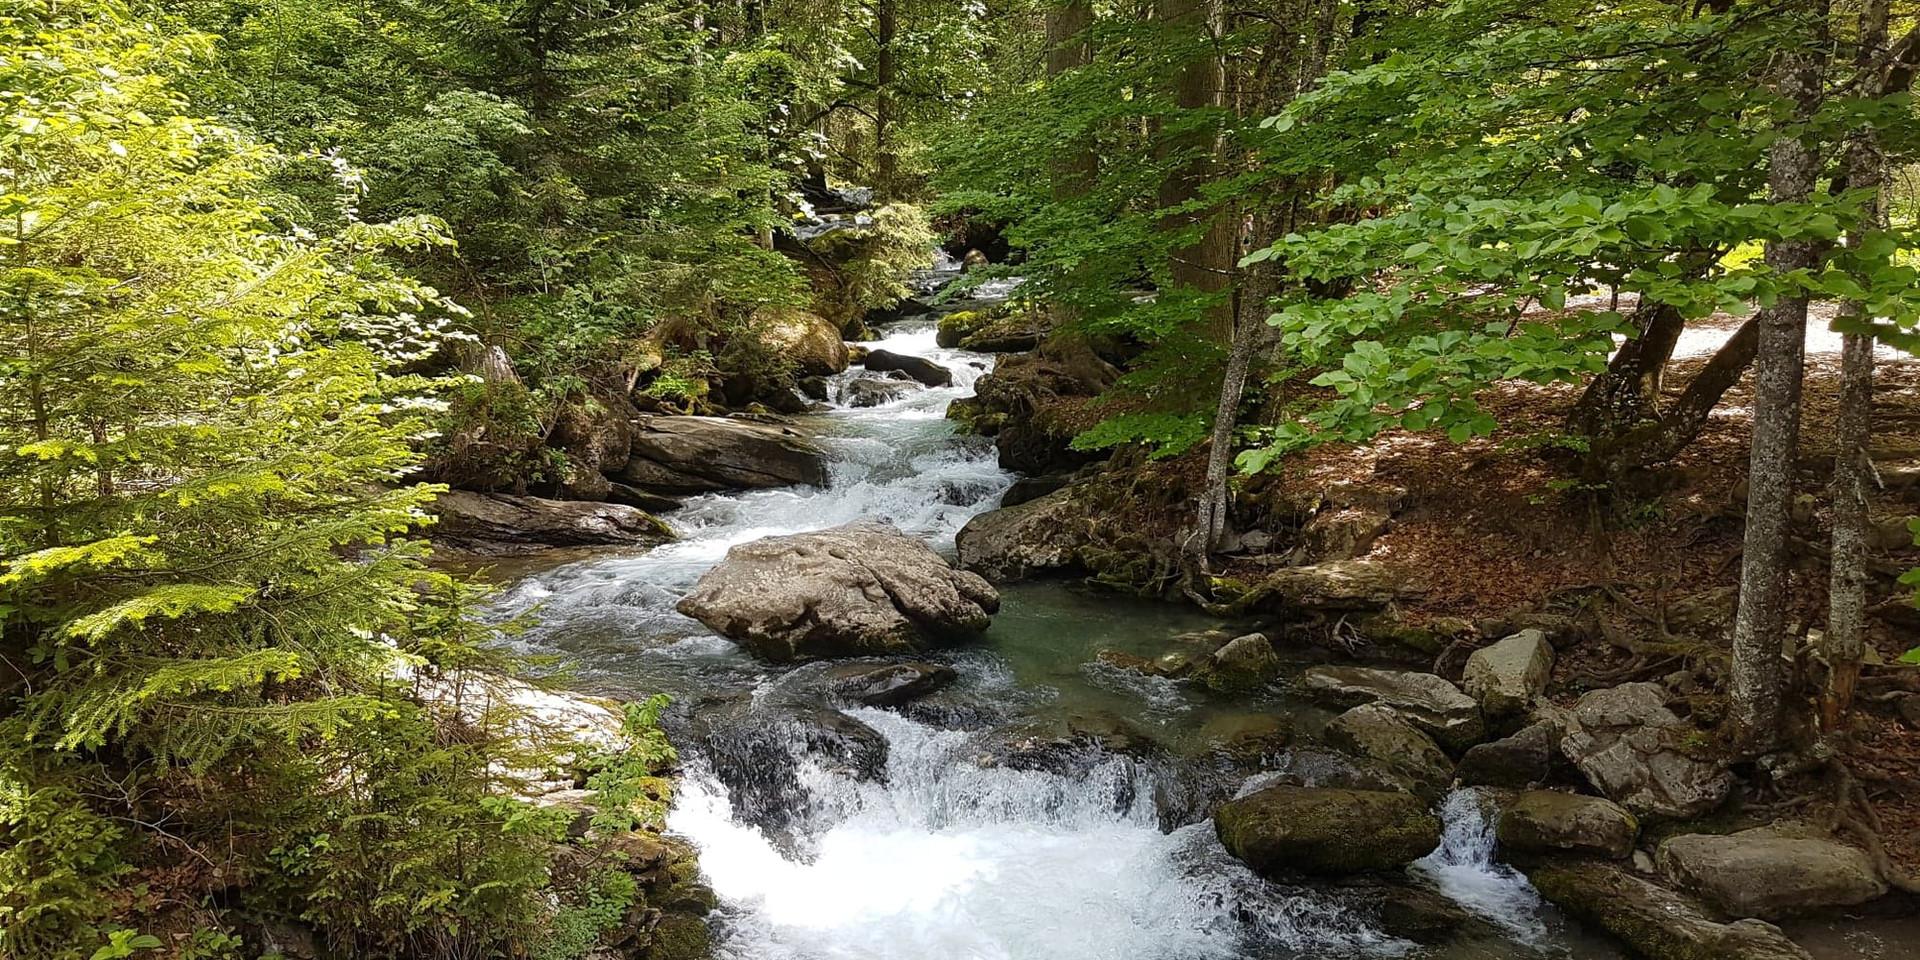 river through trees landscape.jpg